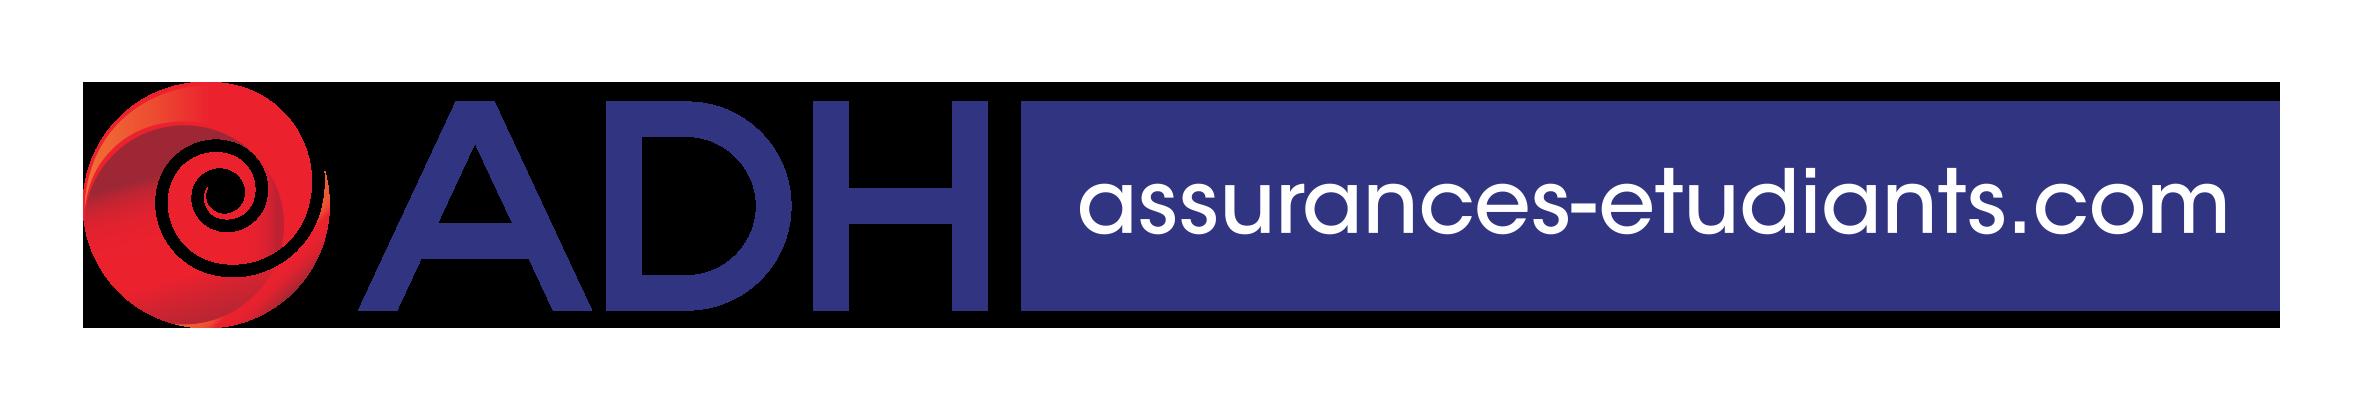 ADH Assurances Etudiants logo